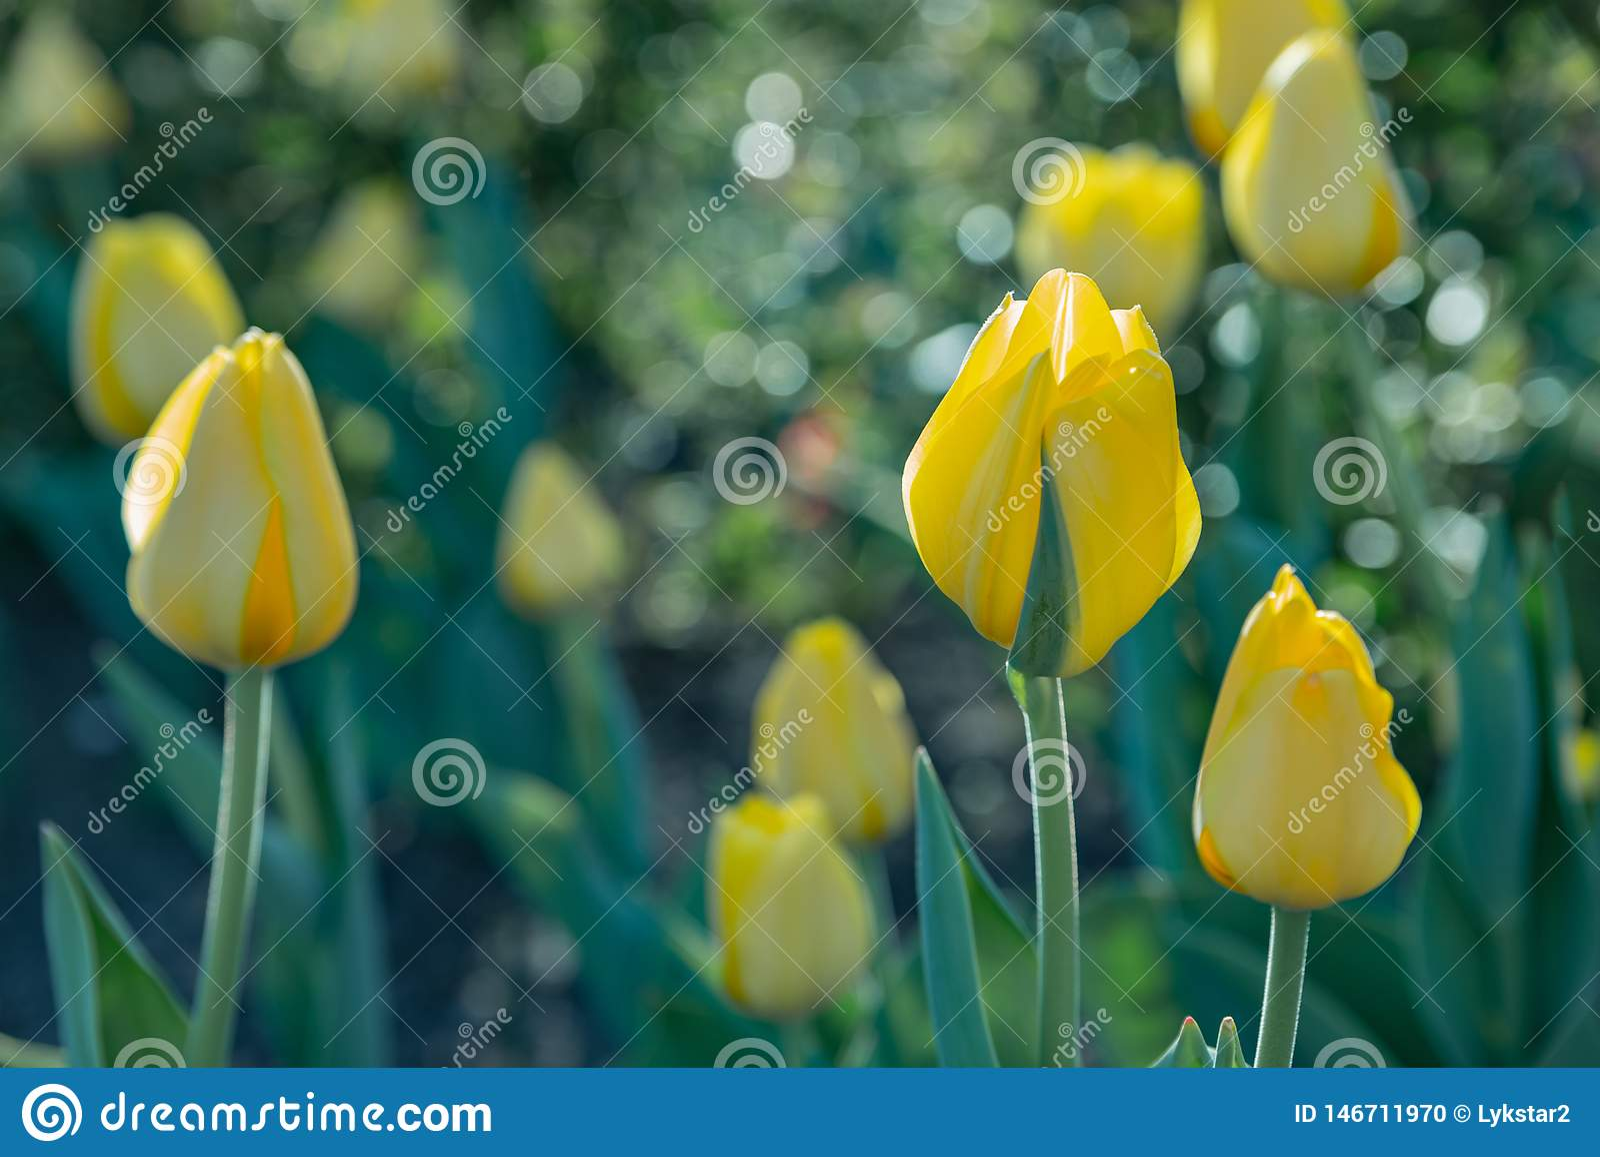 Tulipani gialli su fondo vago verde